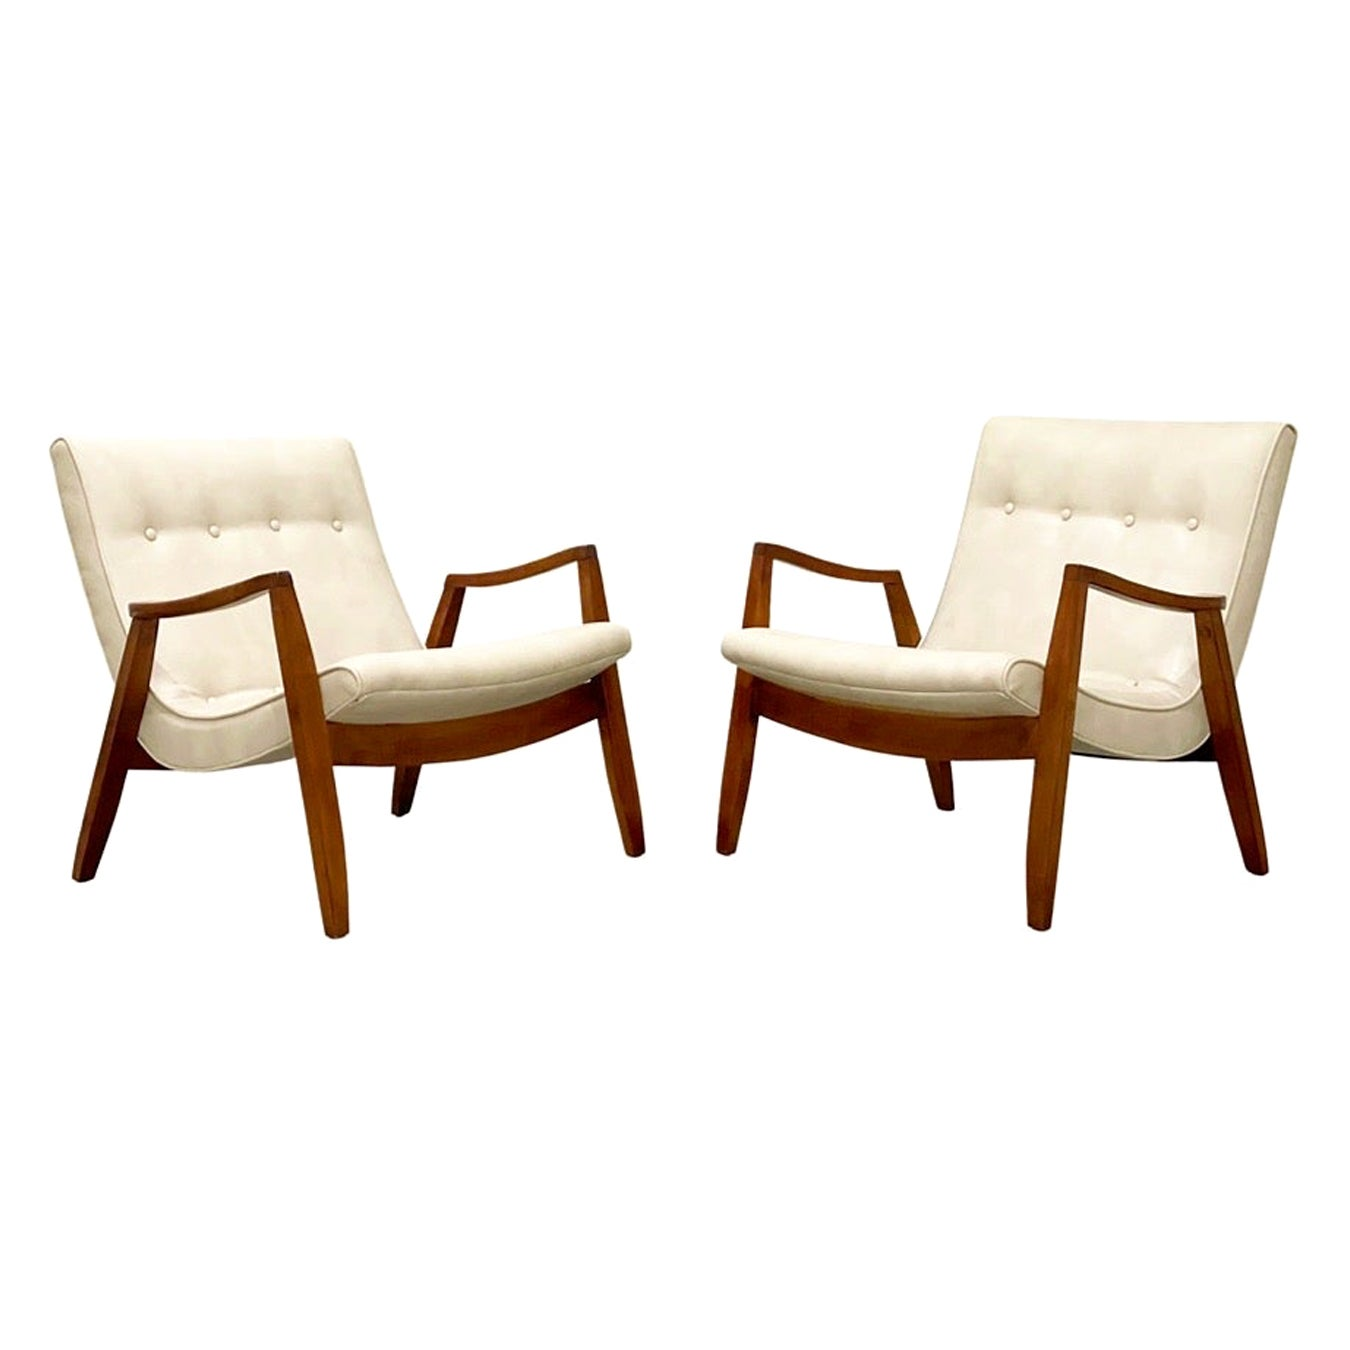 Midcentury Pair Milo Baughman Scoop Lounge Chairs for James Inc, Circa 1953